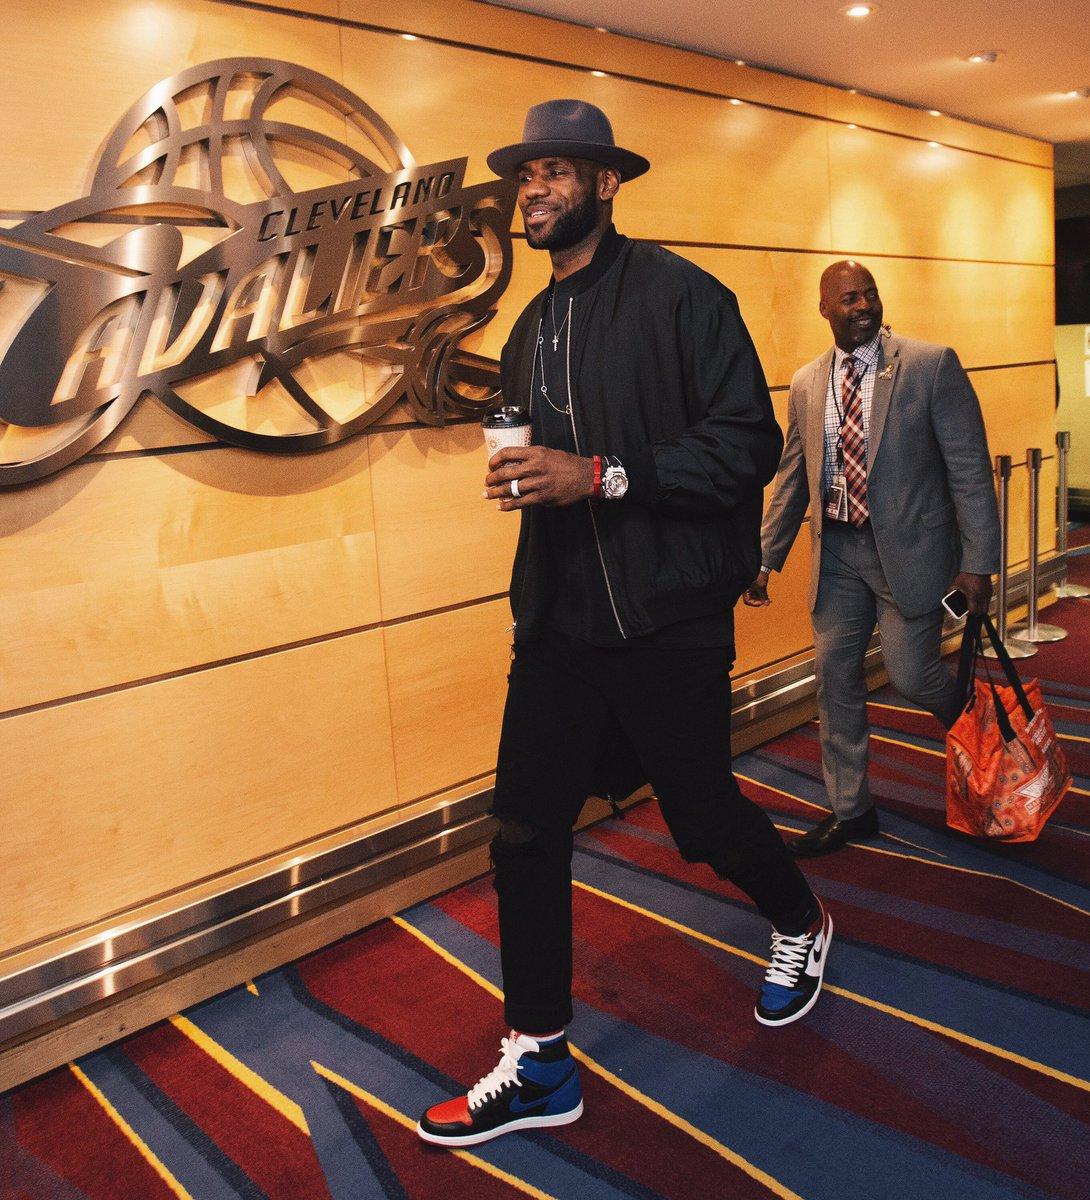 LeBron James arrives in the Air Jordan